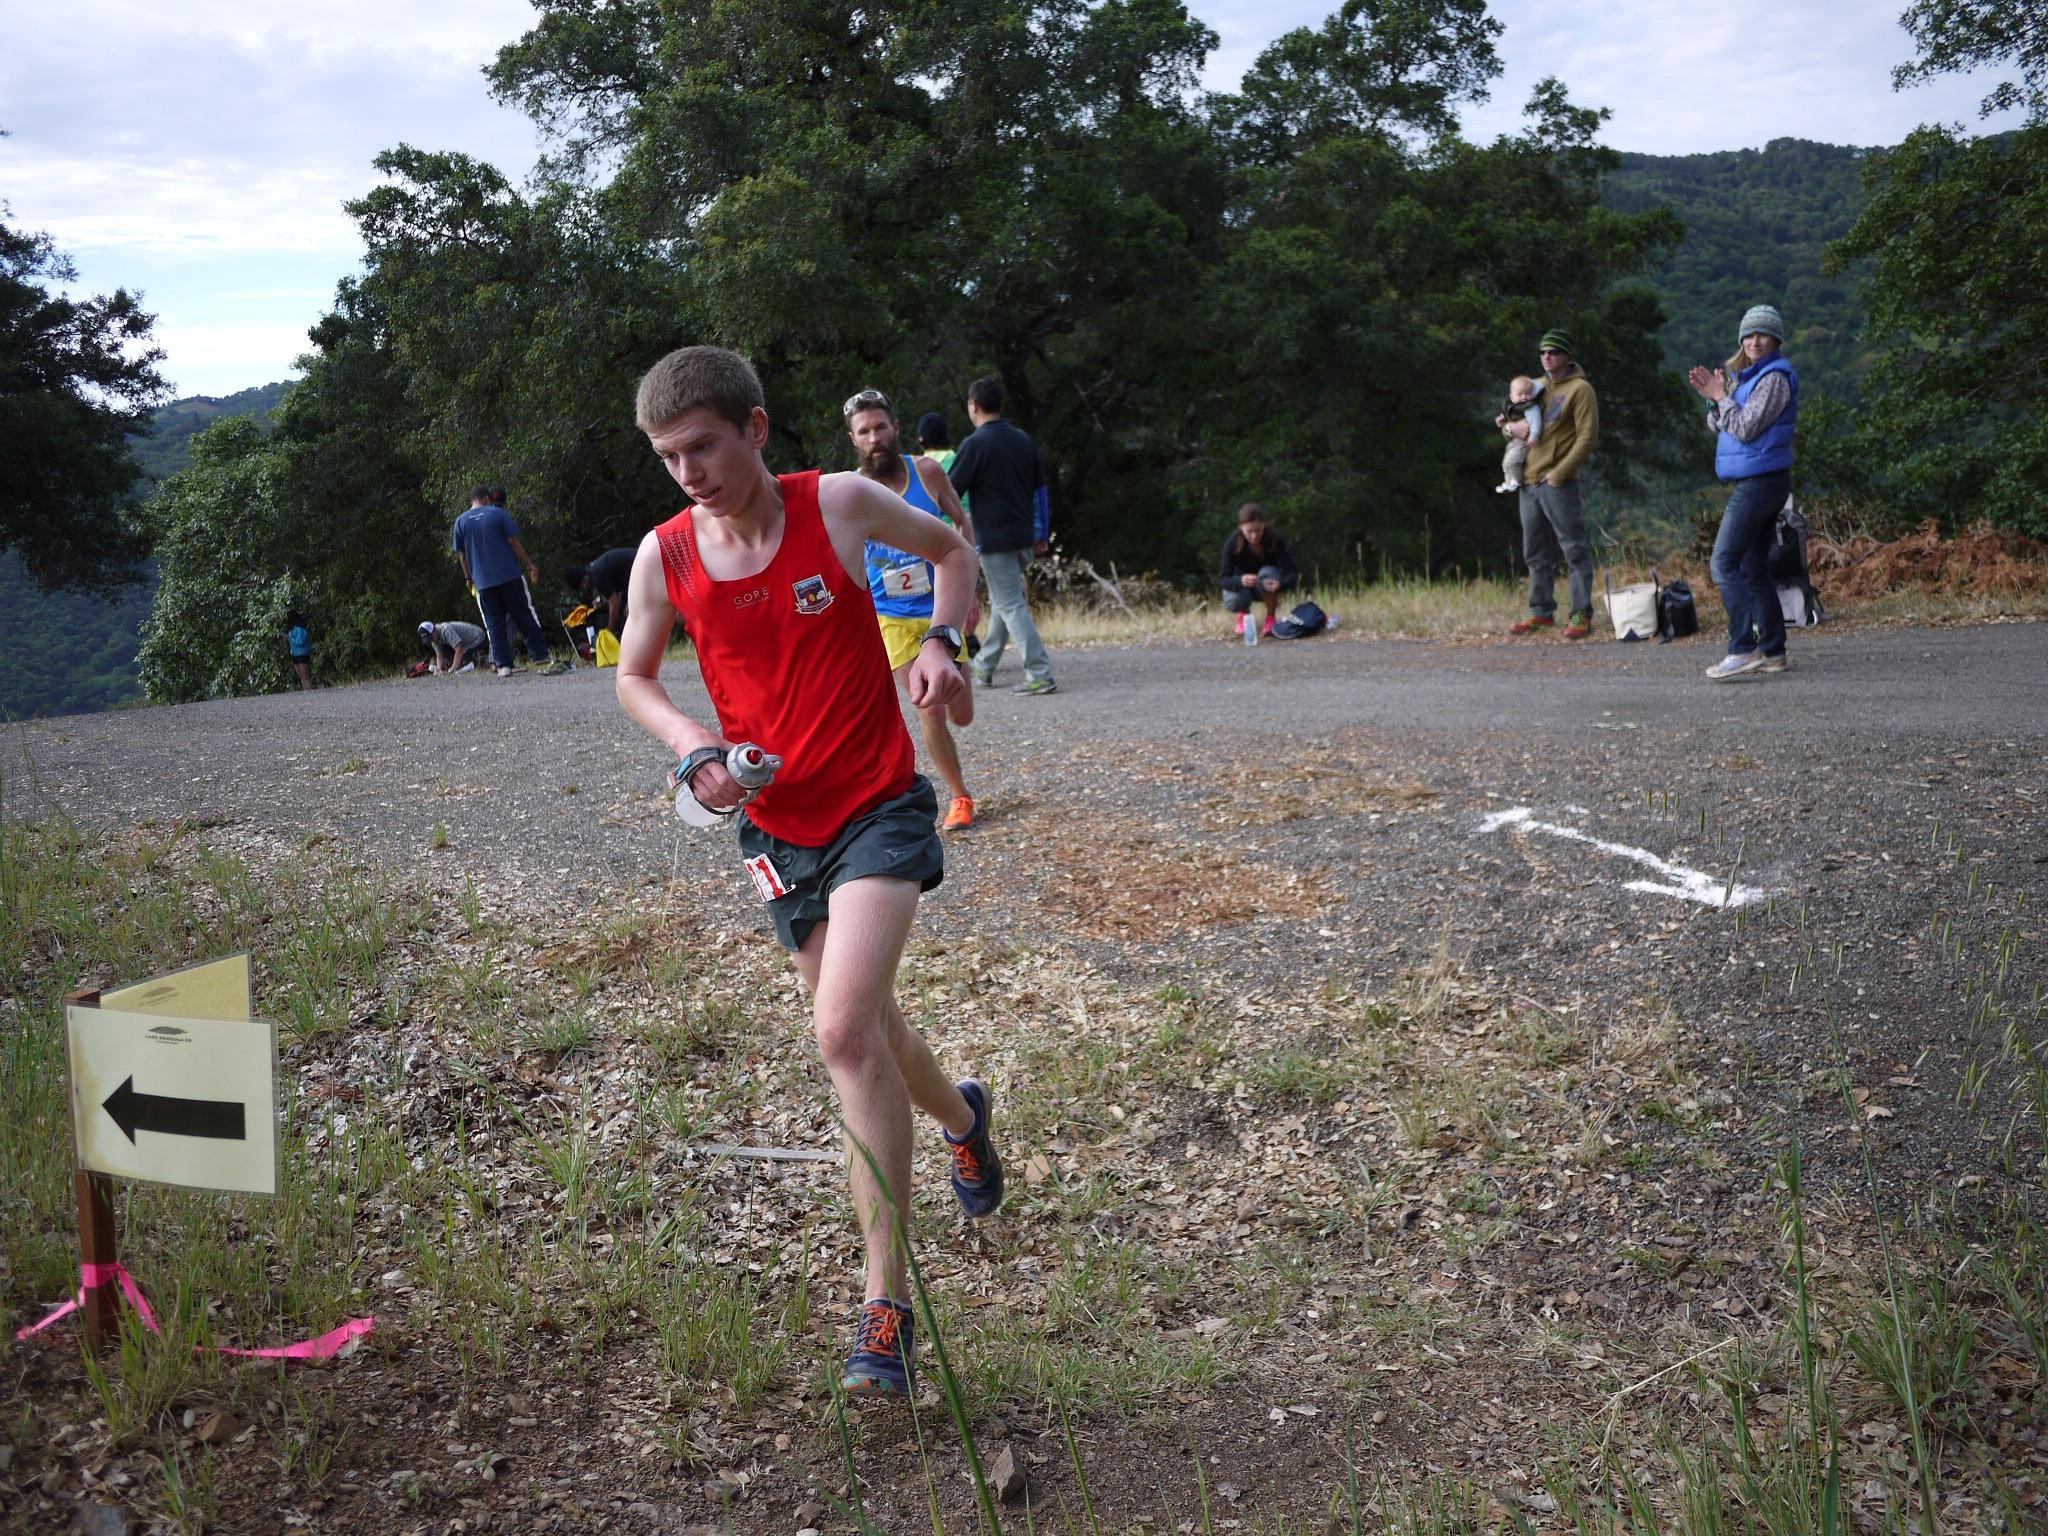 Jared Hazen, followed by Rob Krar, at 2015 Lake Sonoma.